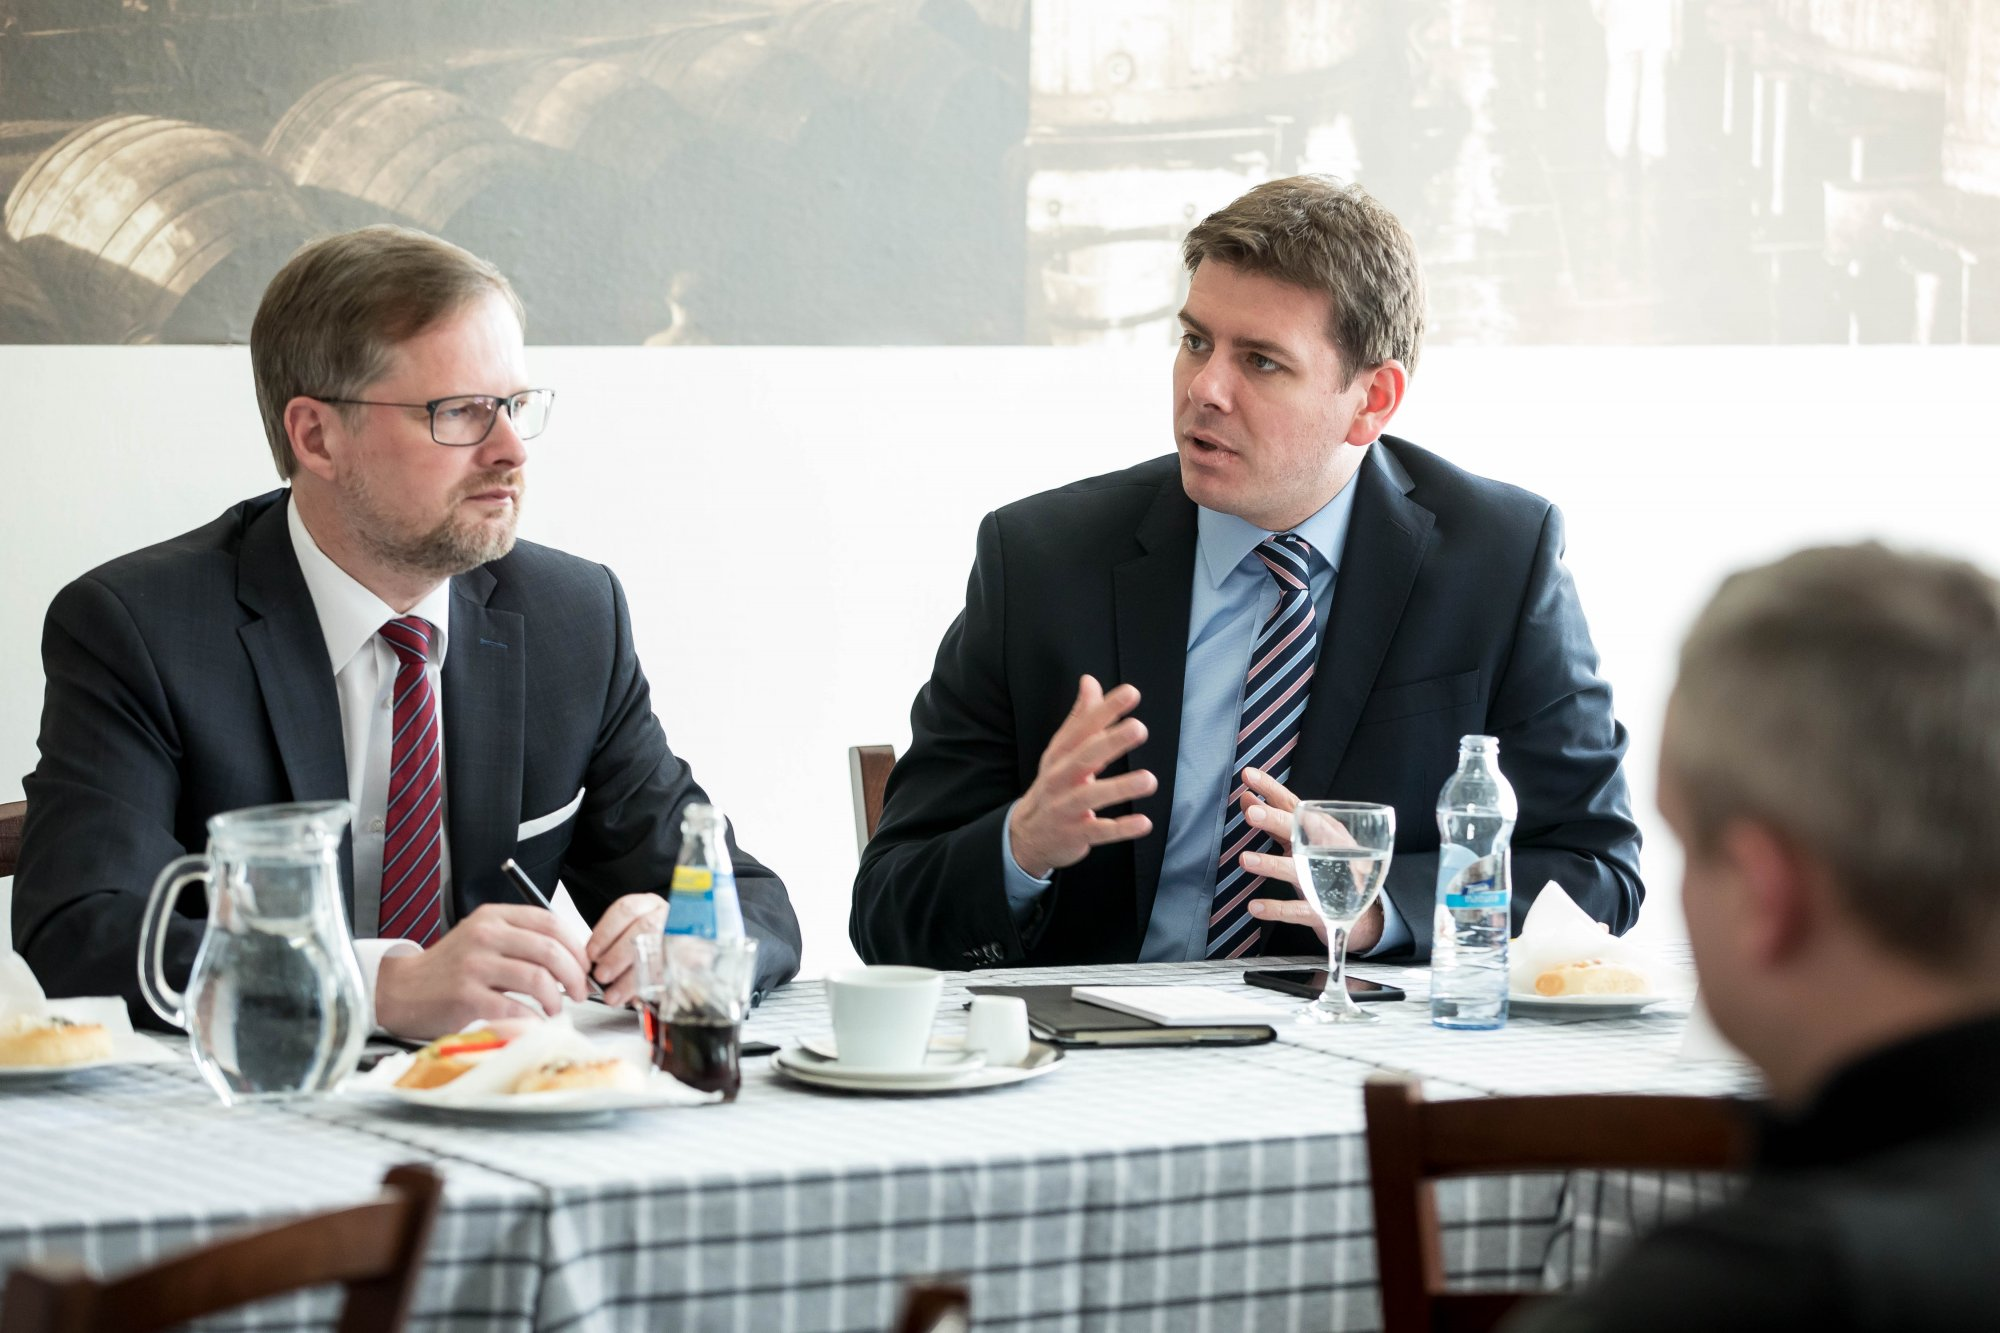 ČRo Plus: Naplánovaný schodek rozpočtu se nám musí podařit srazit, a to i za cenu rozpočtového provizoria